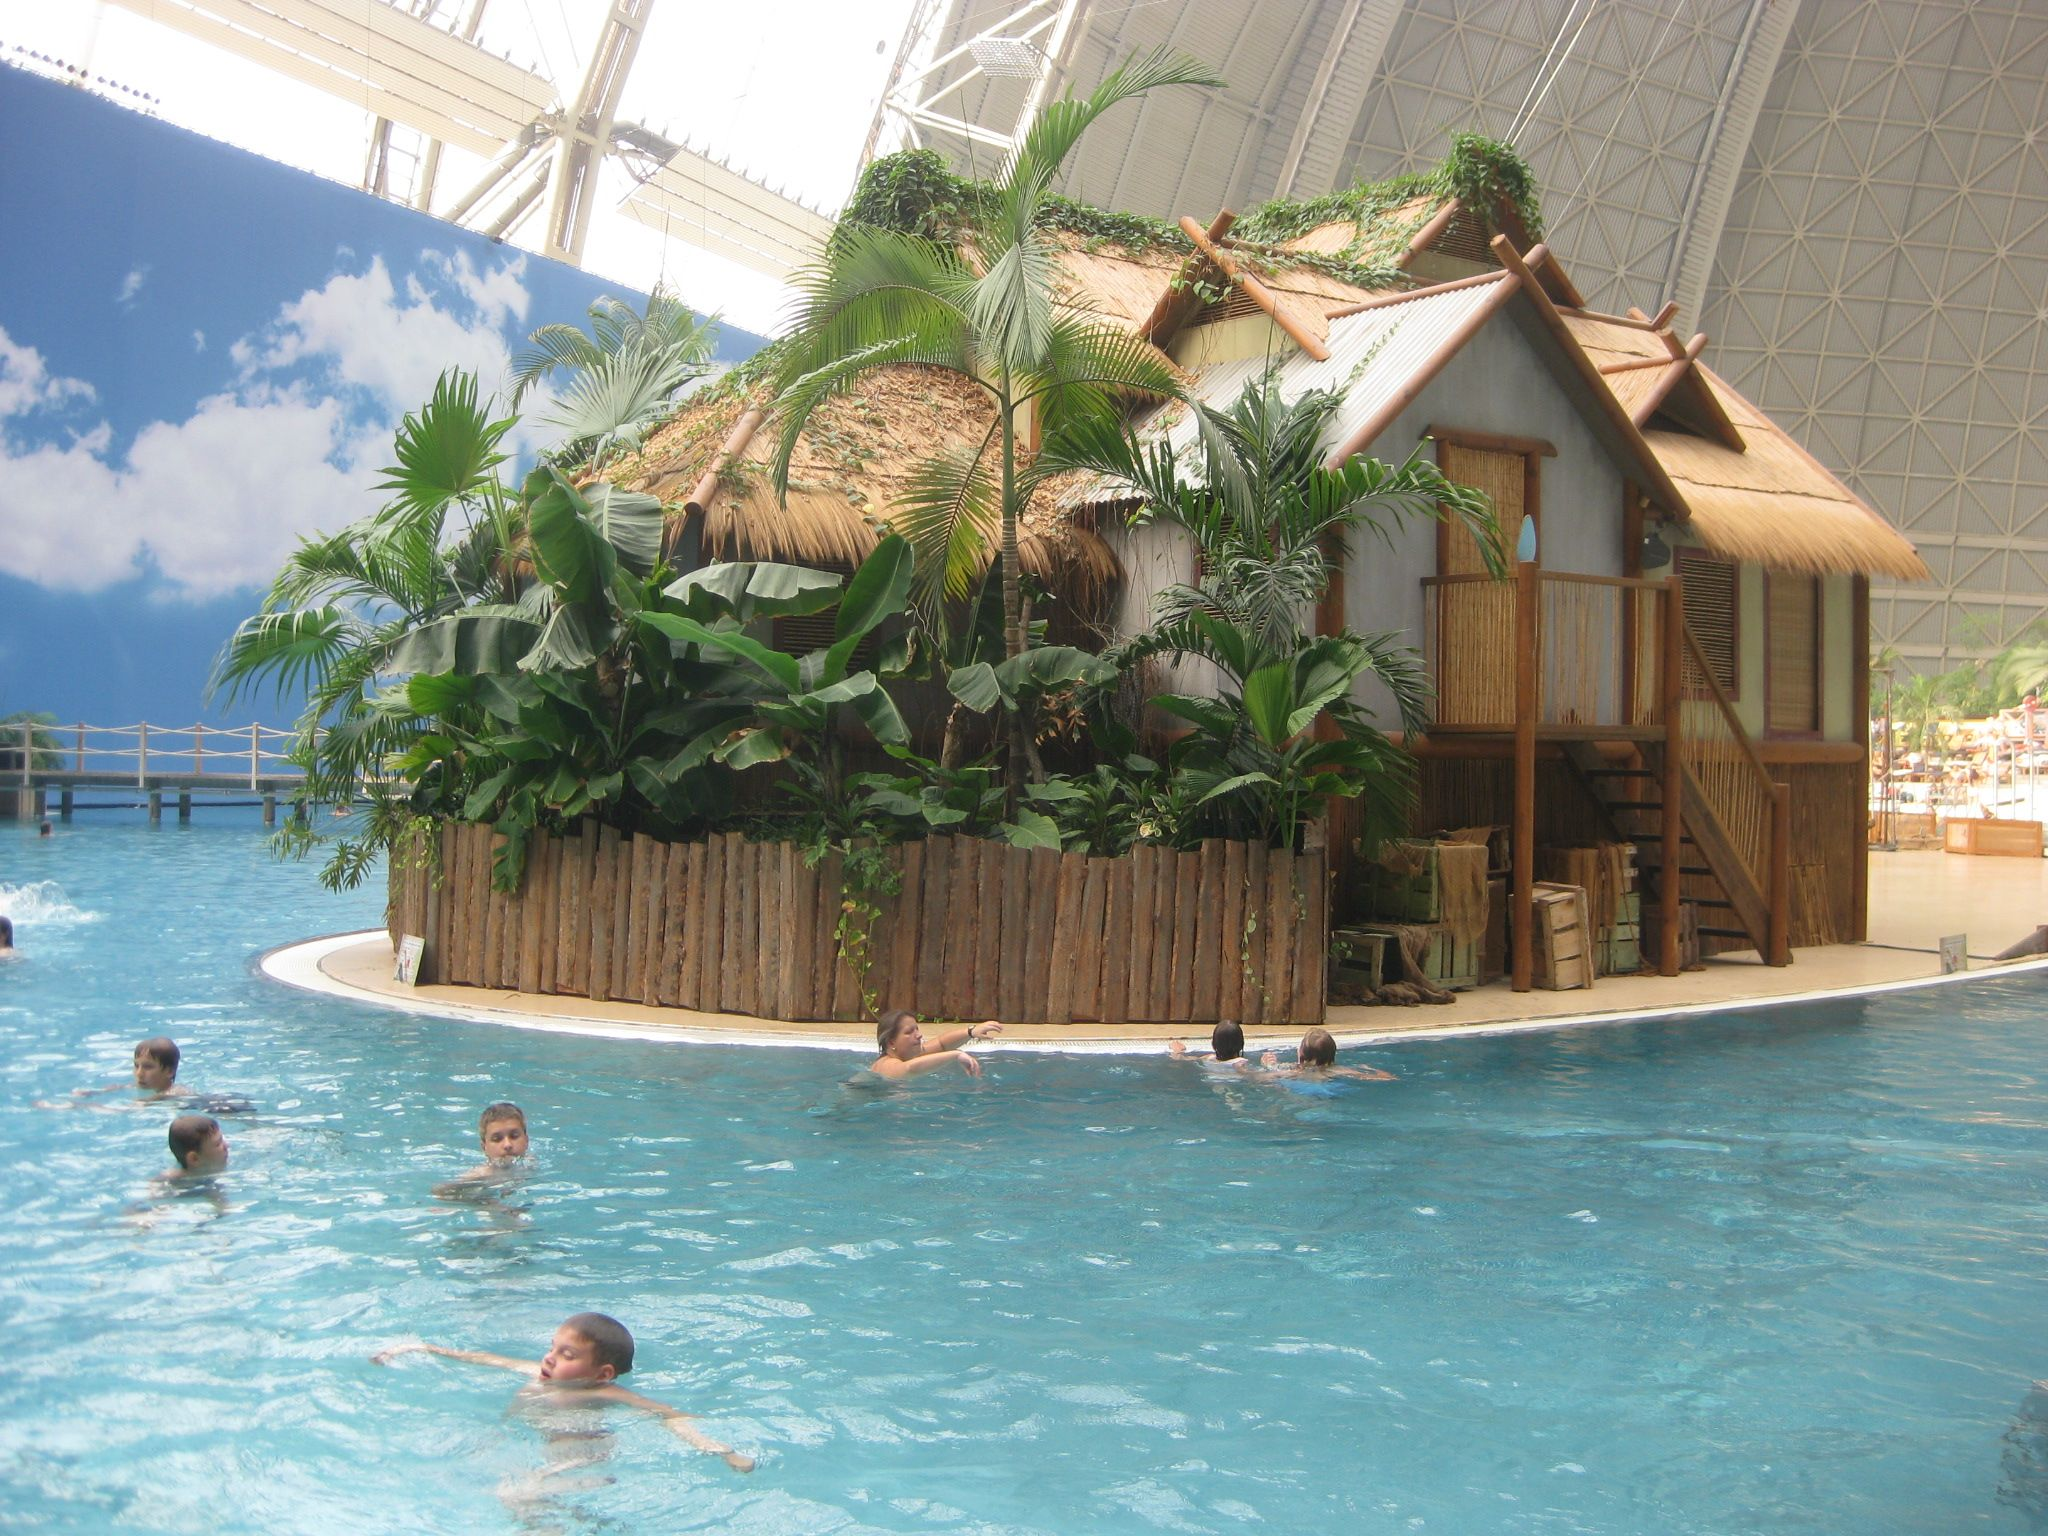 Berlin Tropical Island Ceny